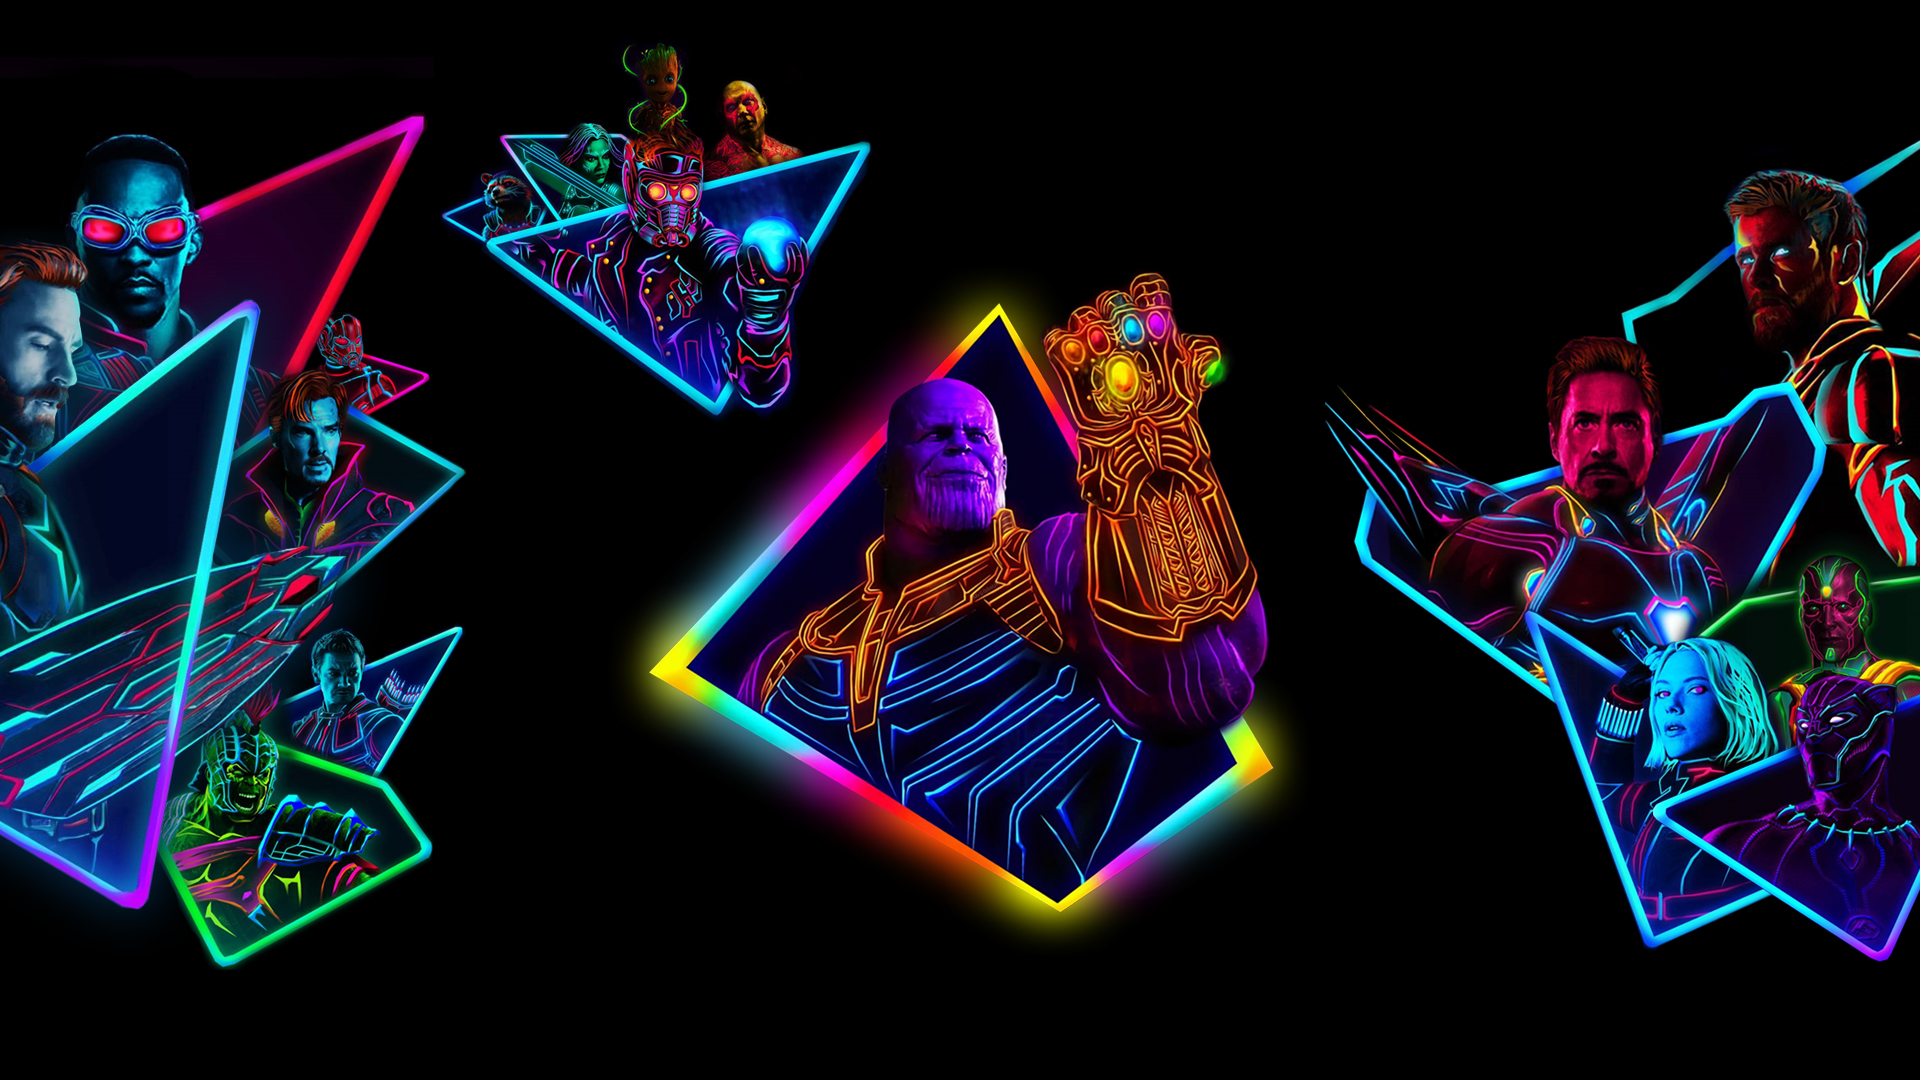 27 Neon Avengers Wallpapers On Wallpapersafari